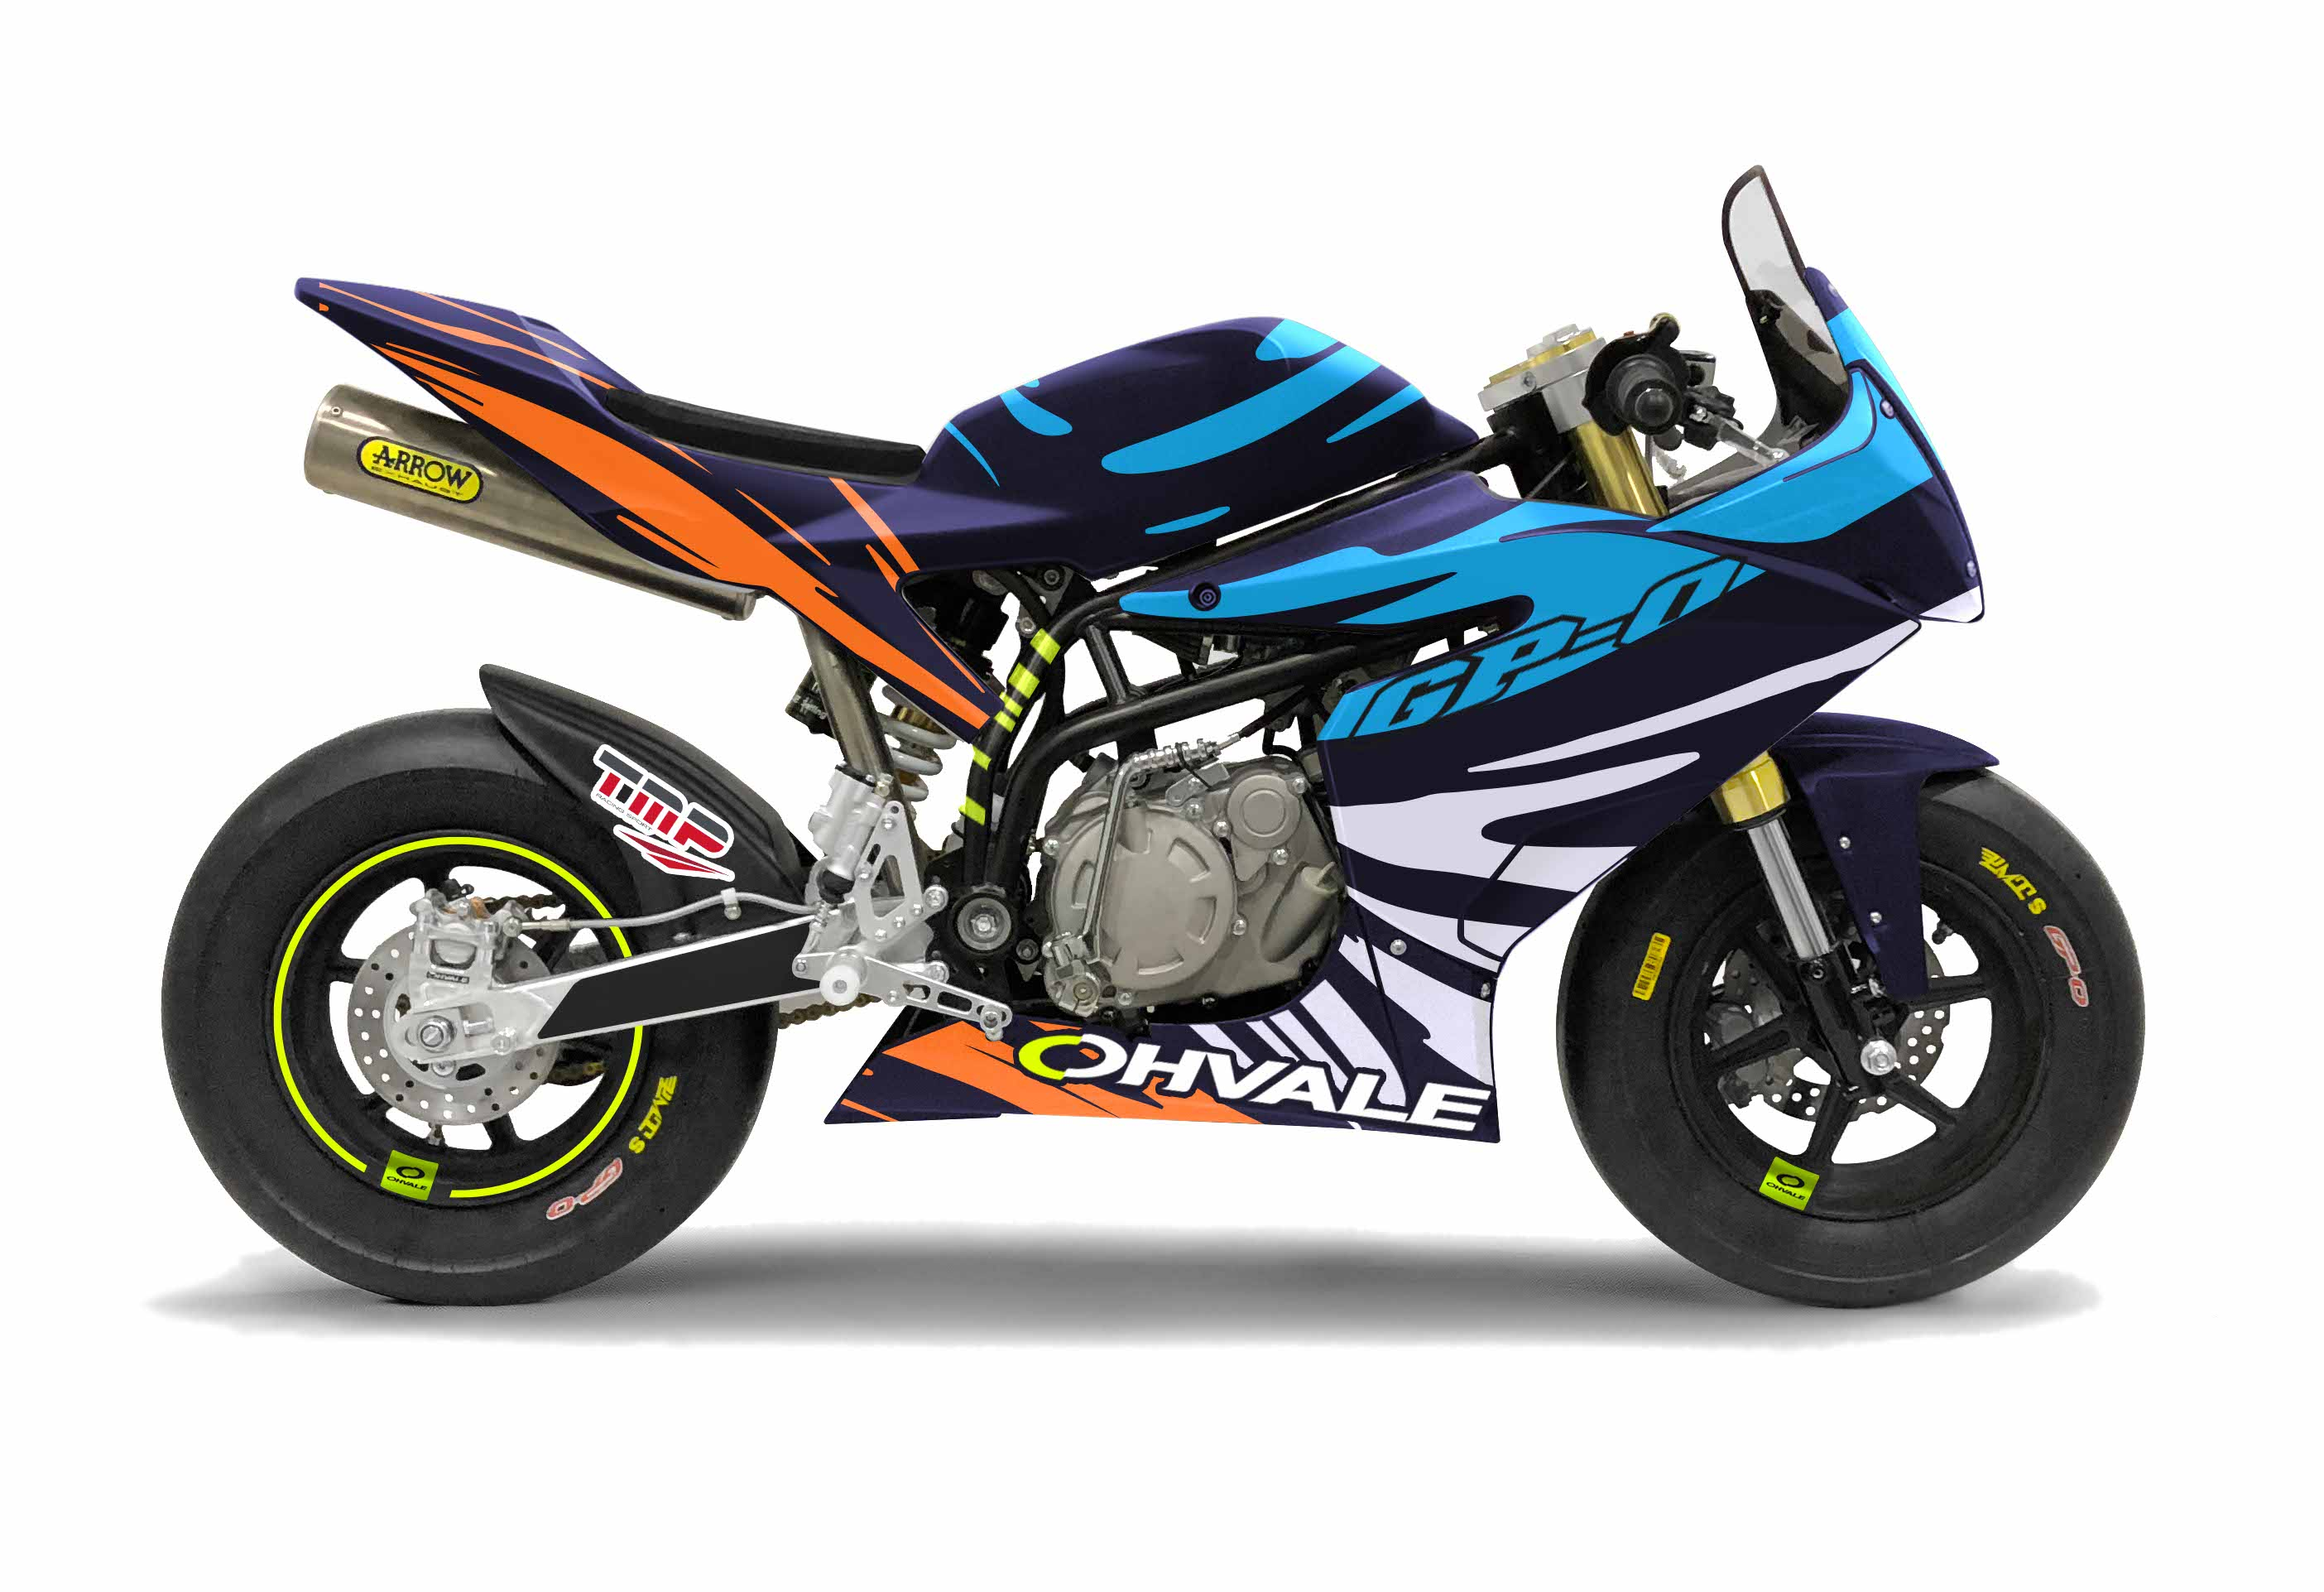 OHVALE GP-0 110 4S Motorrad Minibike - Bike Smith